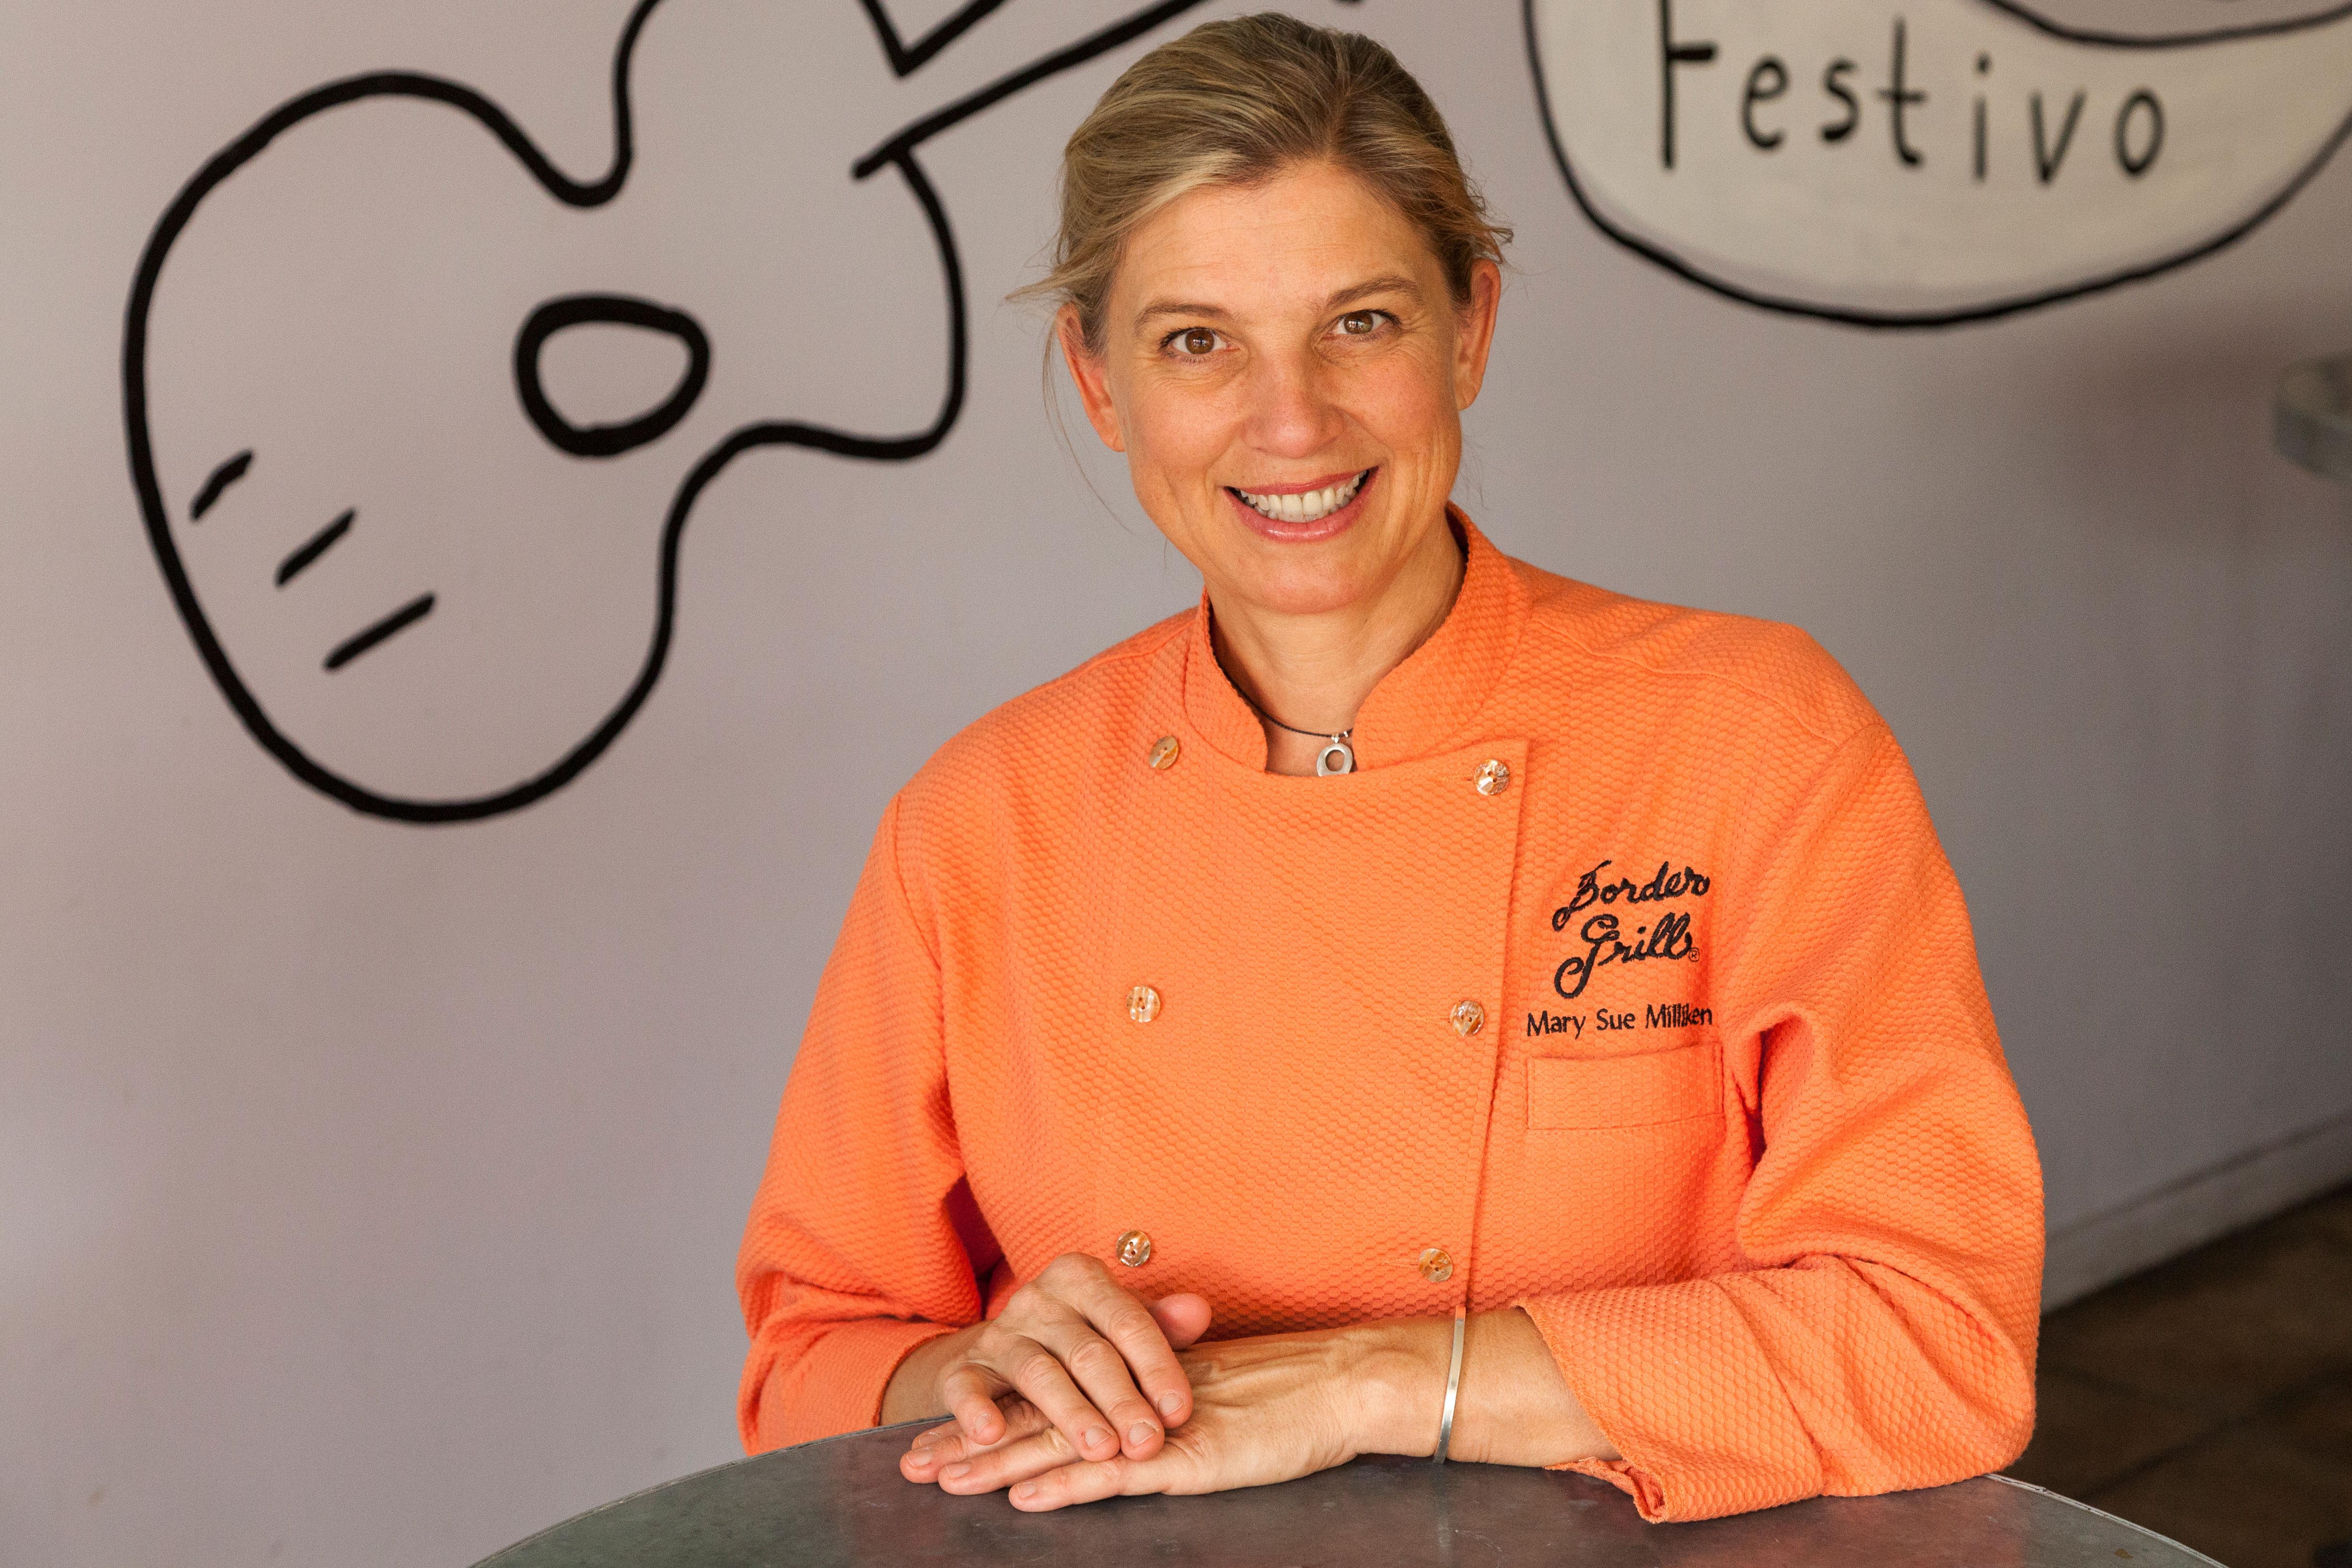 Culinary Workshop & Lunch with Chef Mary Sue Milliken & Chef Bob Blumer